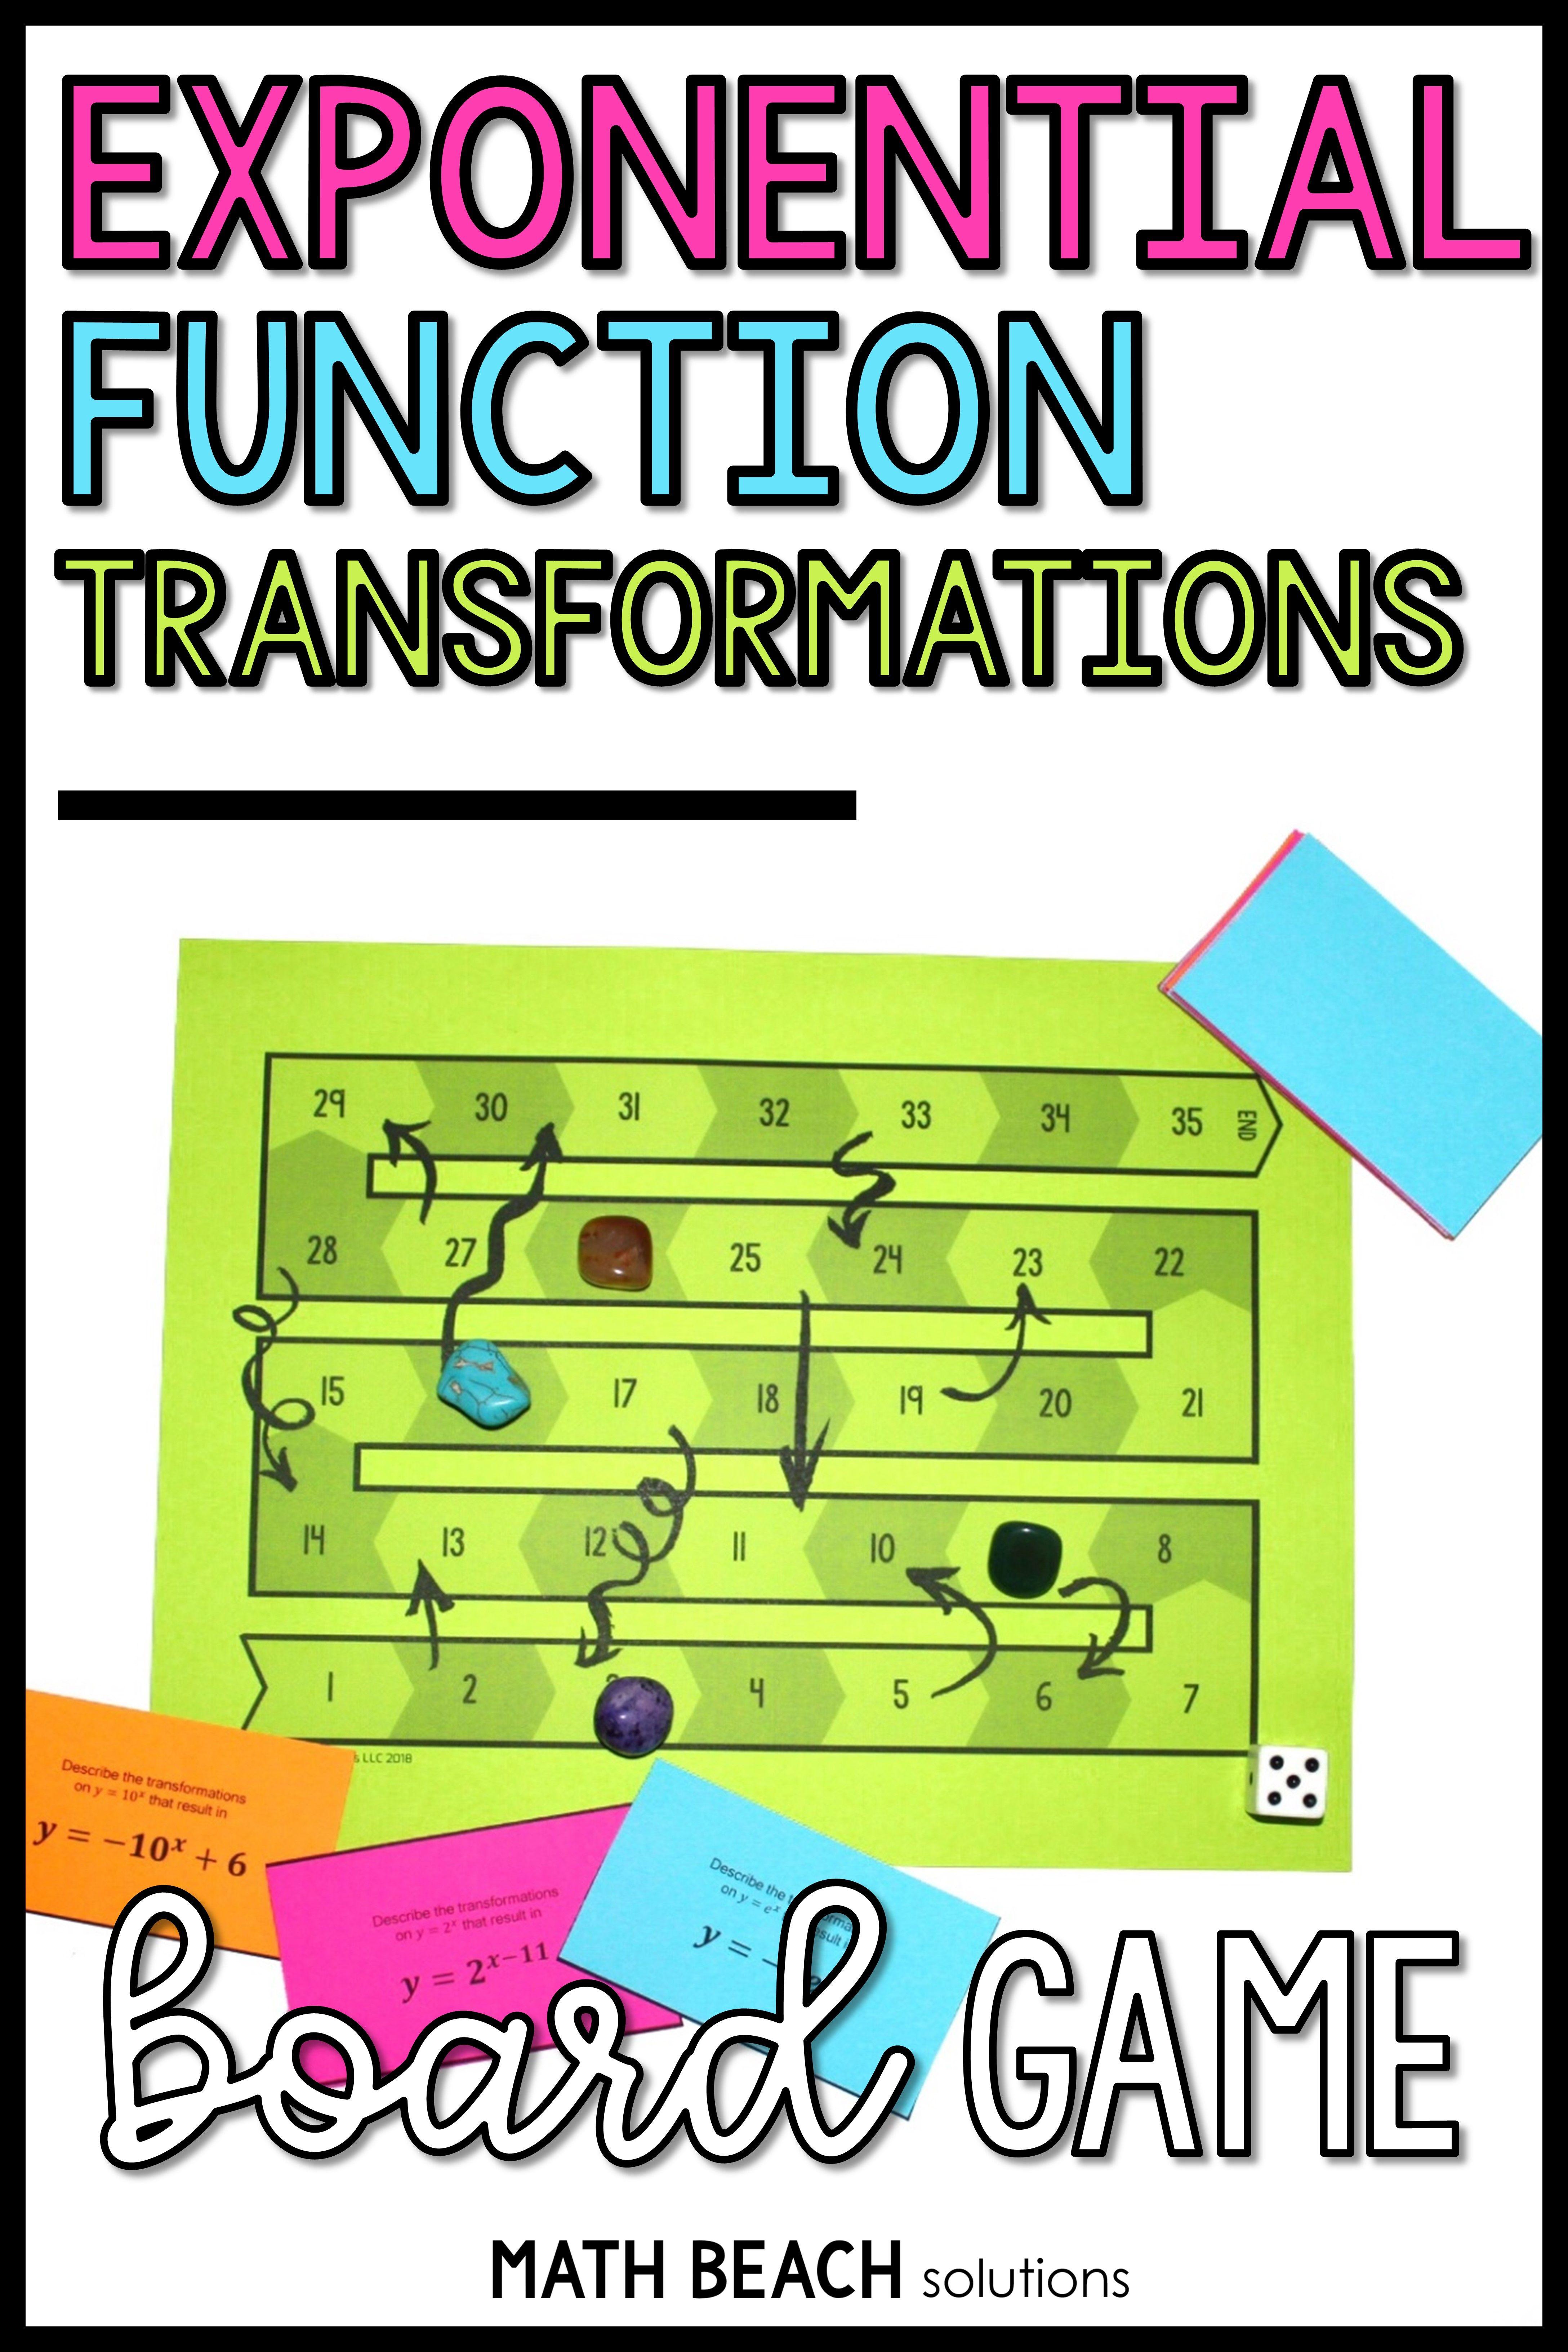 Exponential Function Transformations Board Game Activity Exponential Functions Algebra Worksheets Algebra Activities